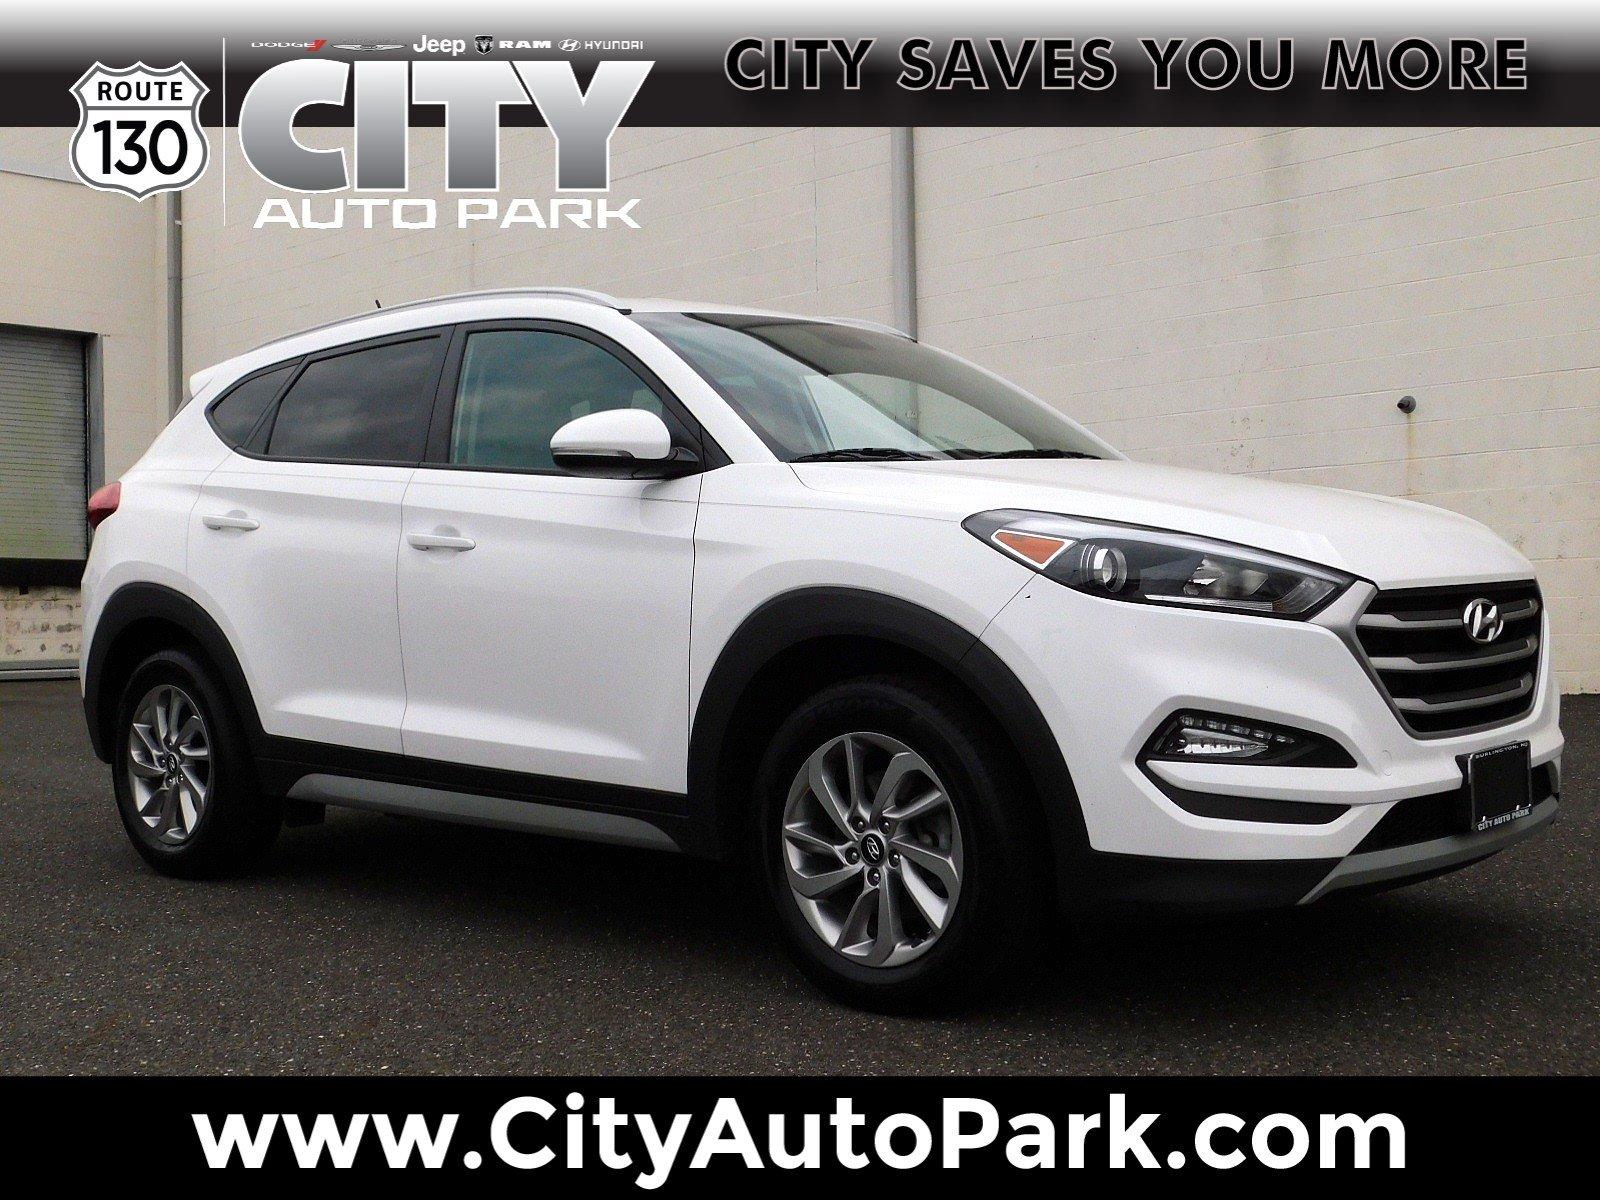 2017 Hyundai Tucson Eco Eco AWD